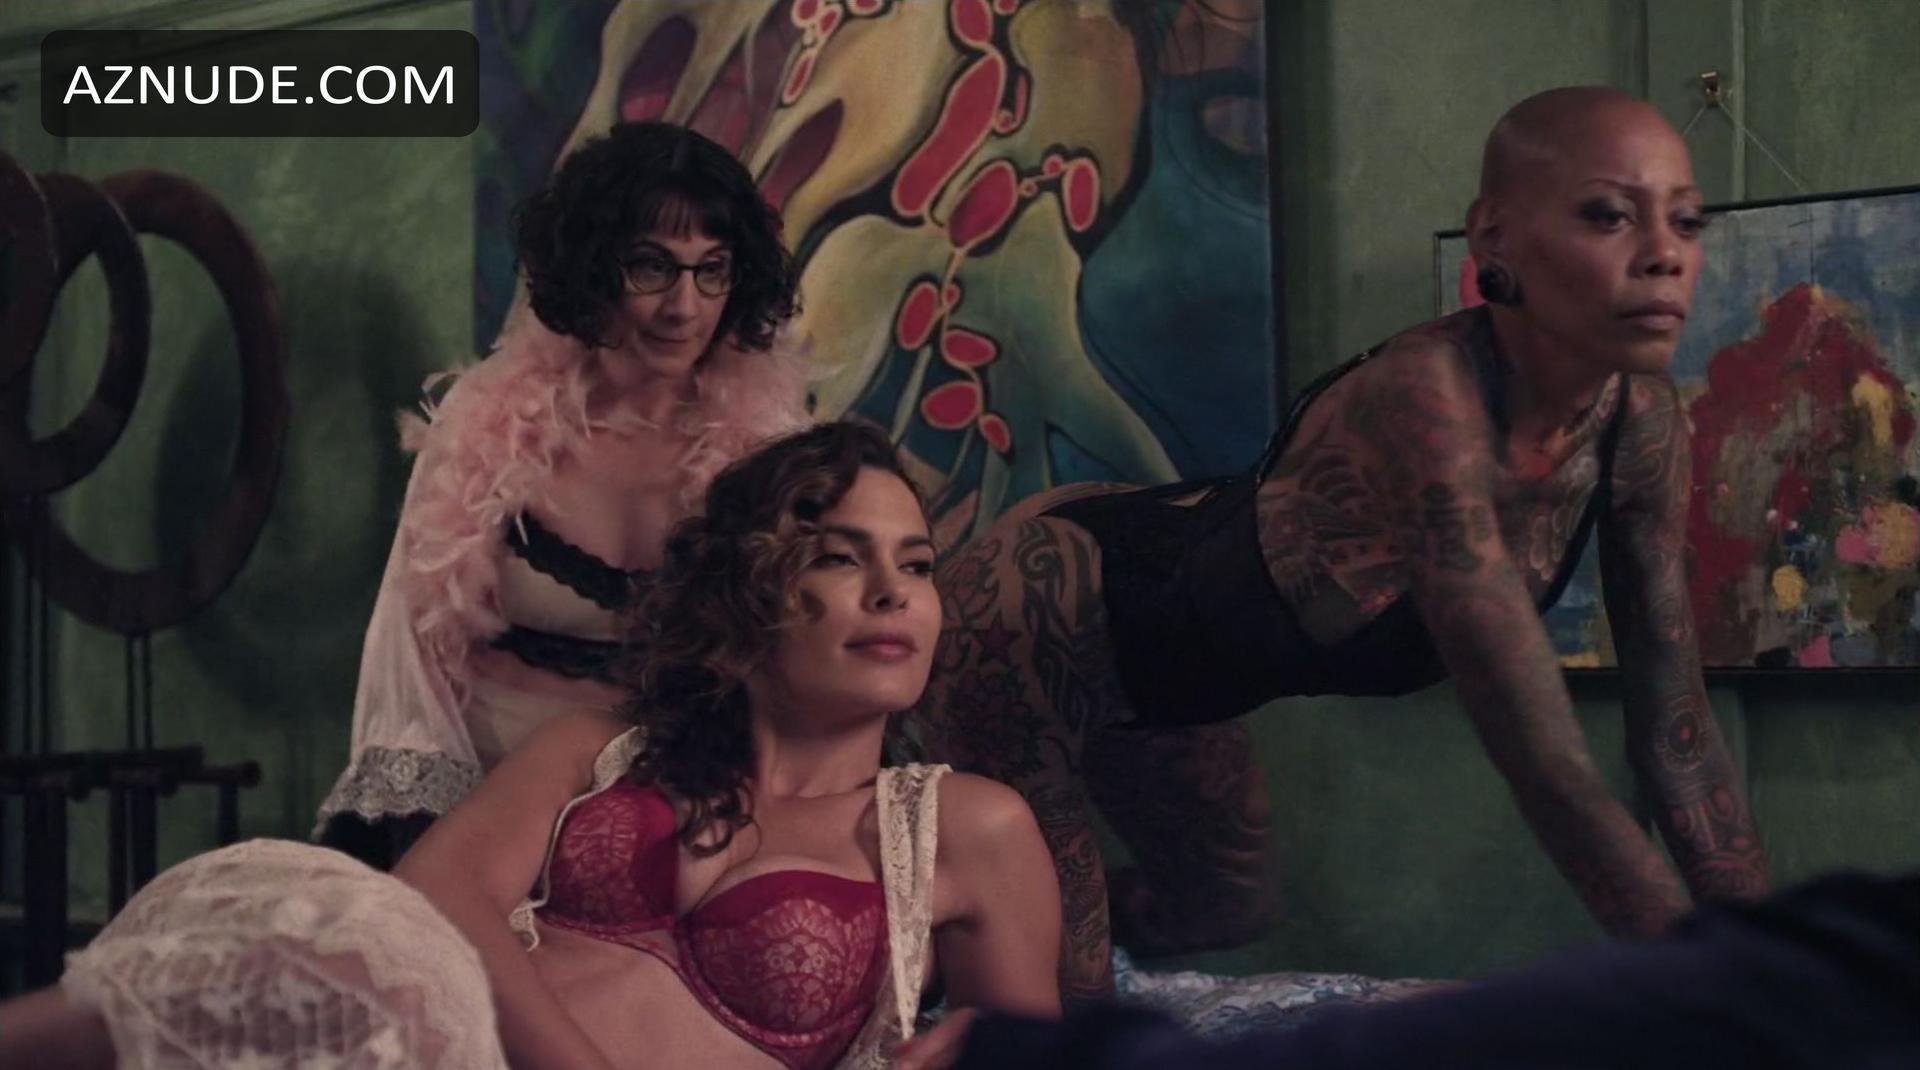 Fee sex videos of debra wilson